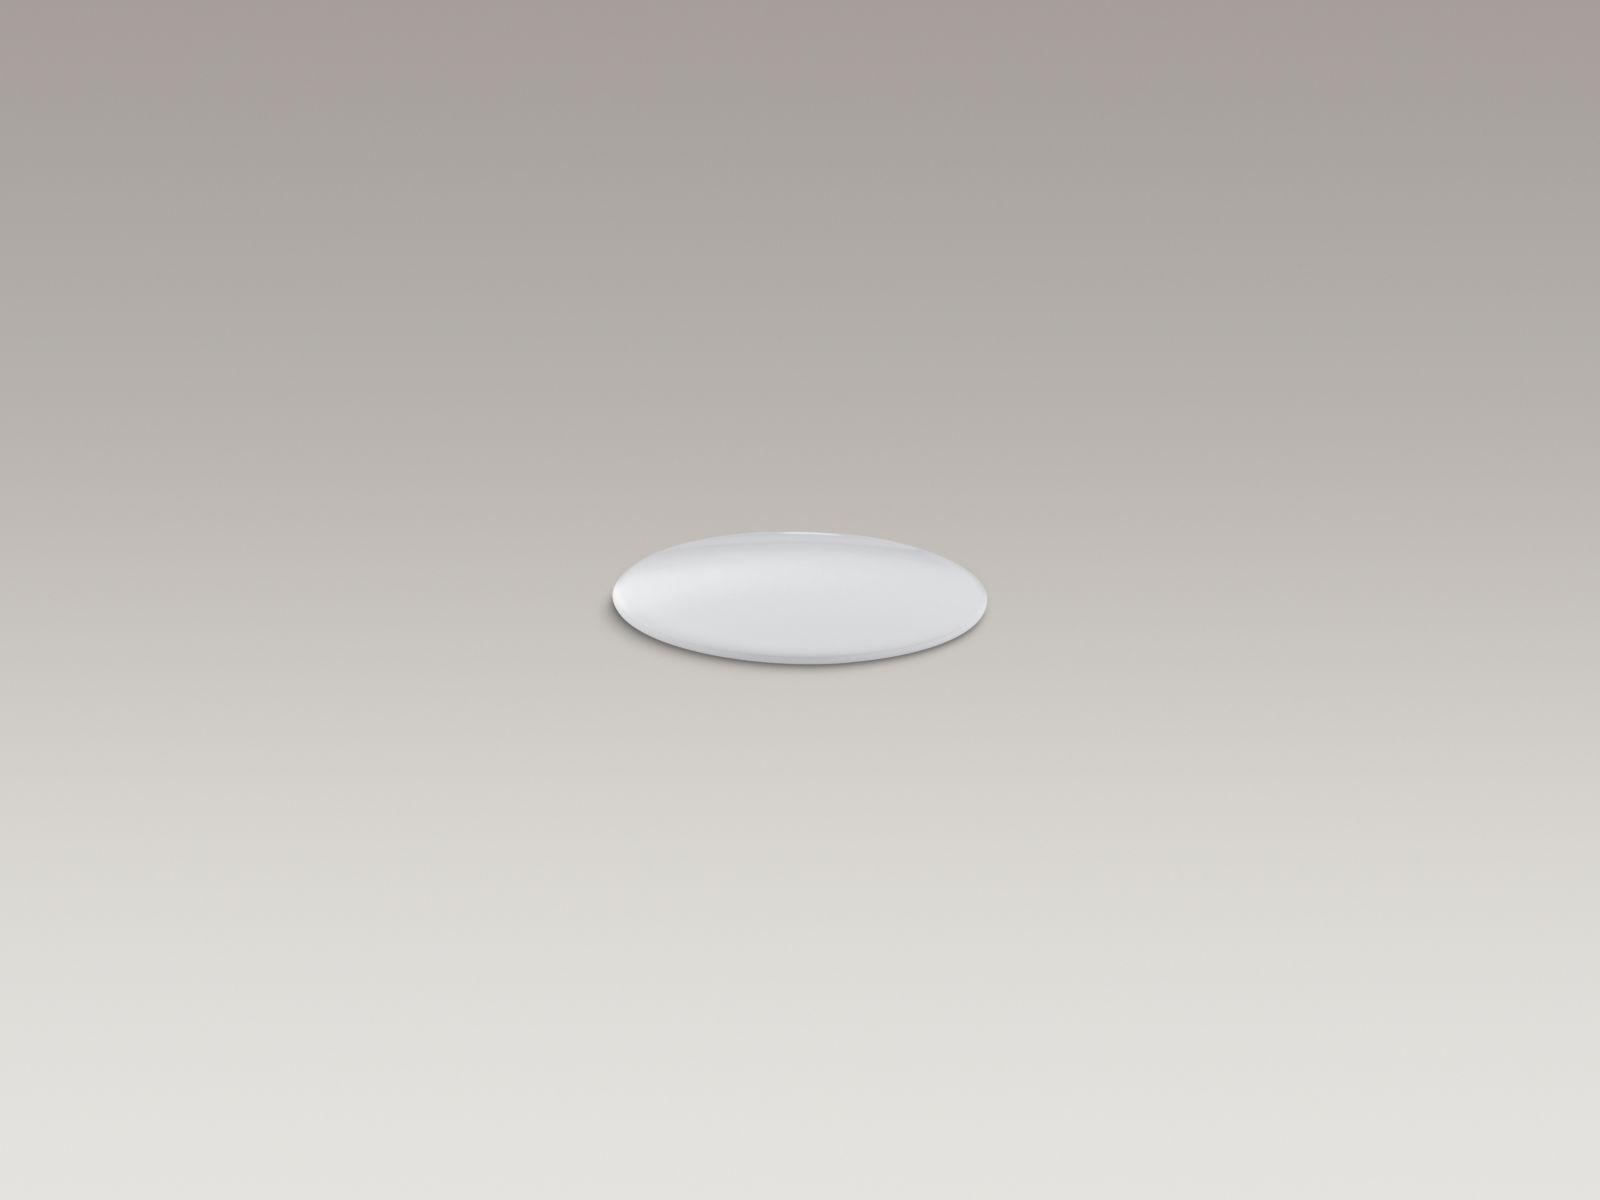 Kohler K-8830-0 Kitchen and Bathroom Sink Extra Hole Cover White